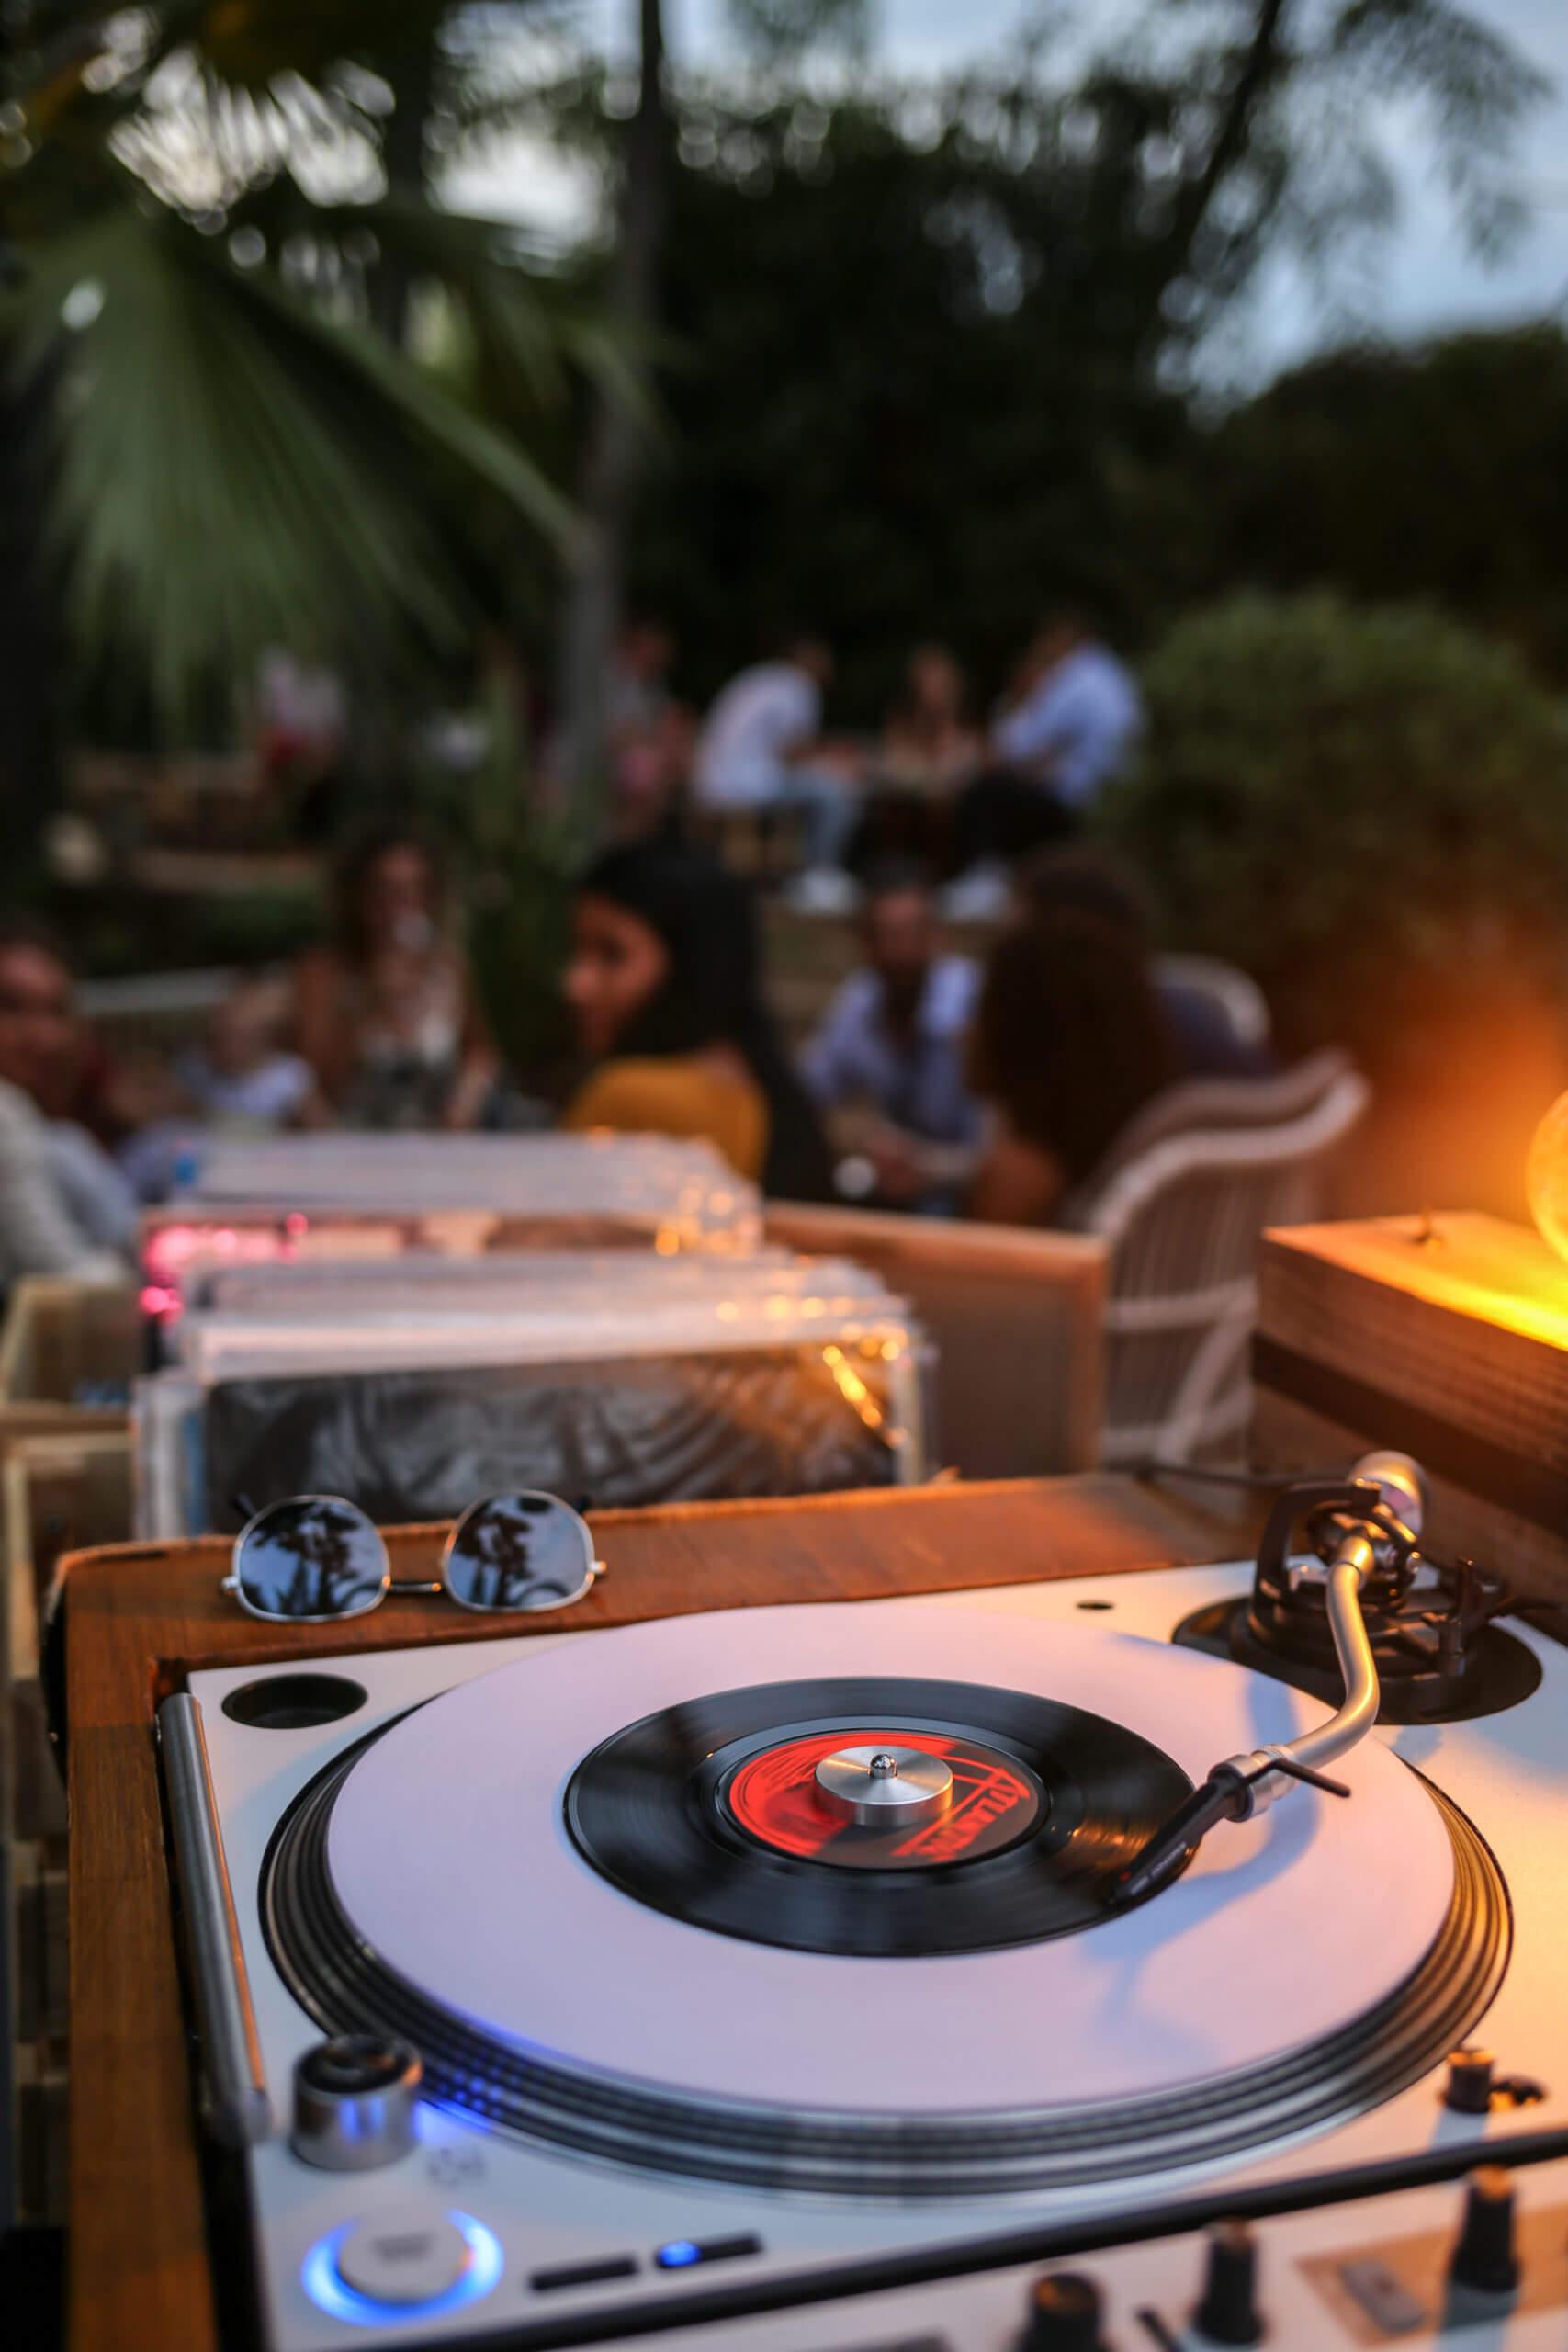 dj_vinyle_vinyle_vintage_retro_french_riviera